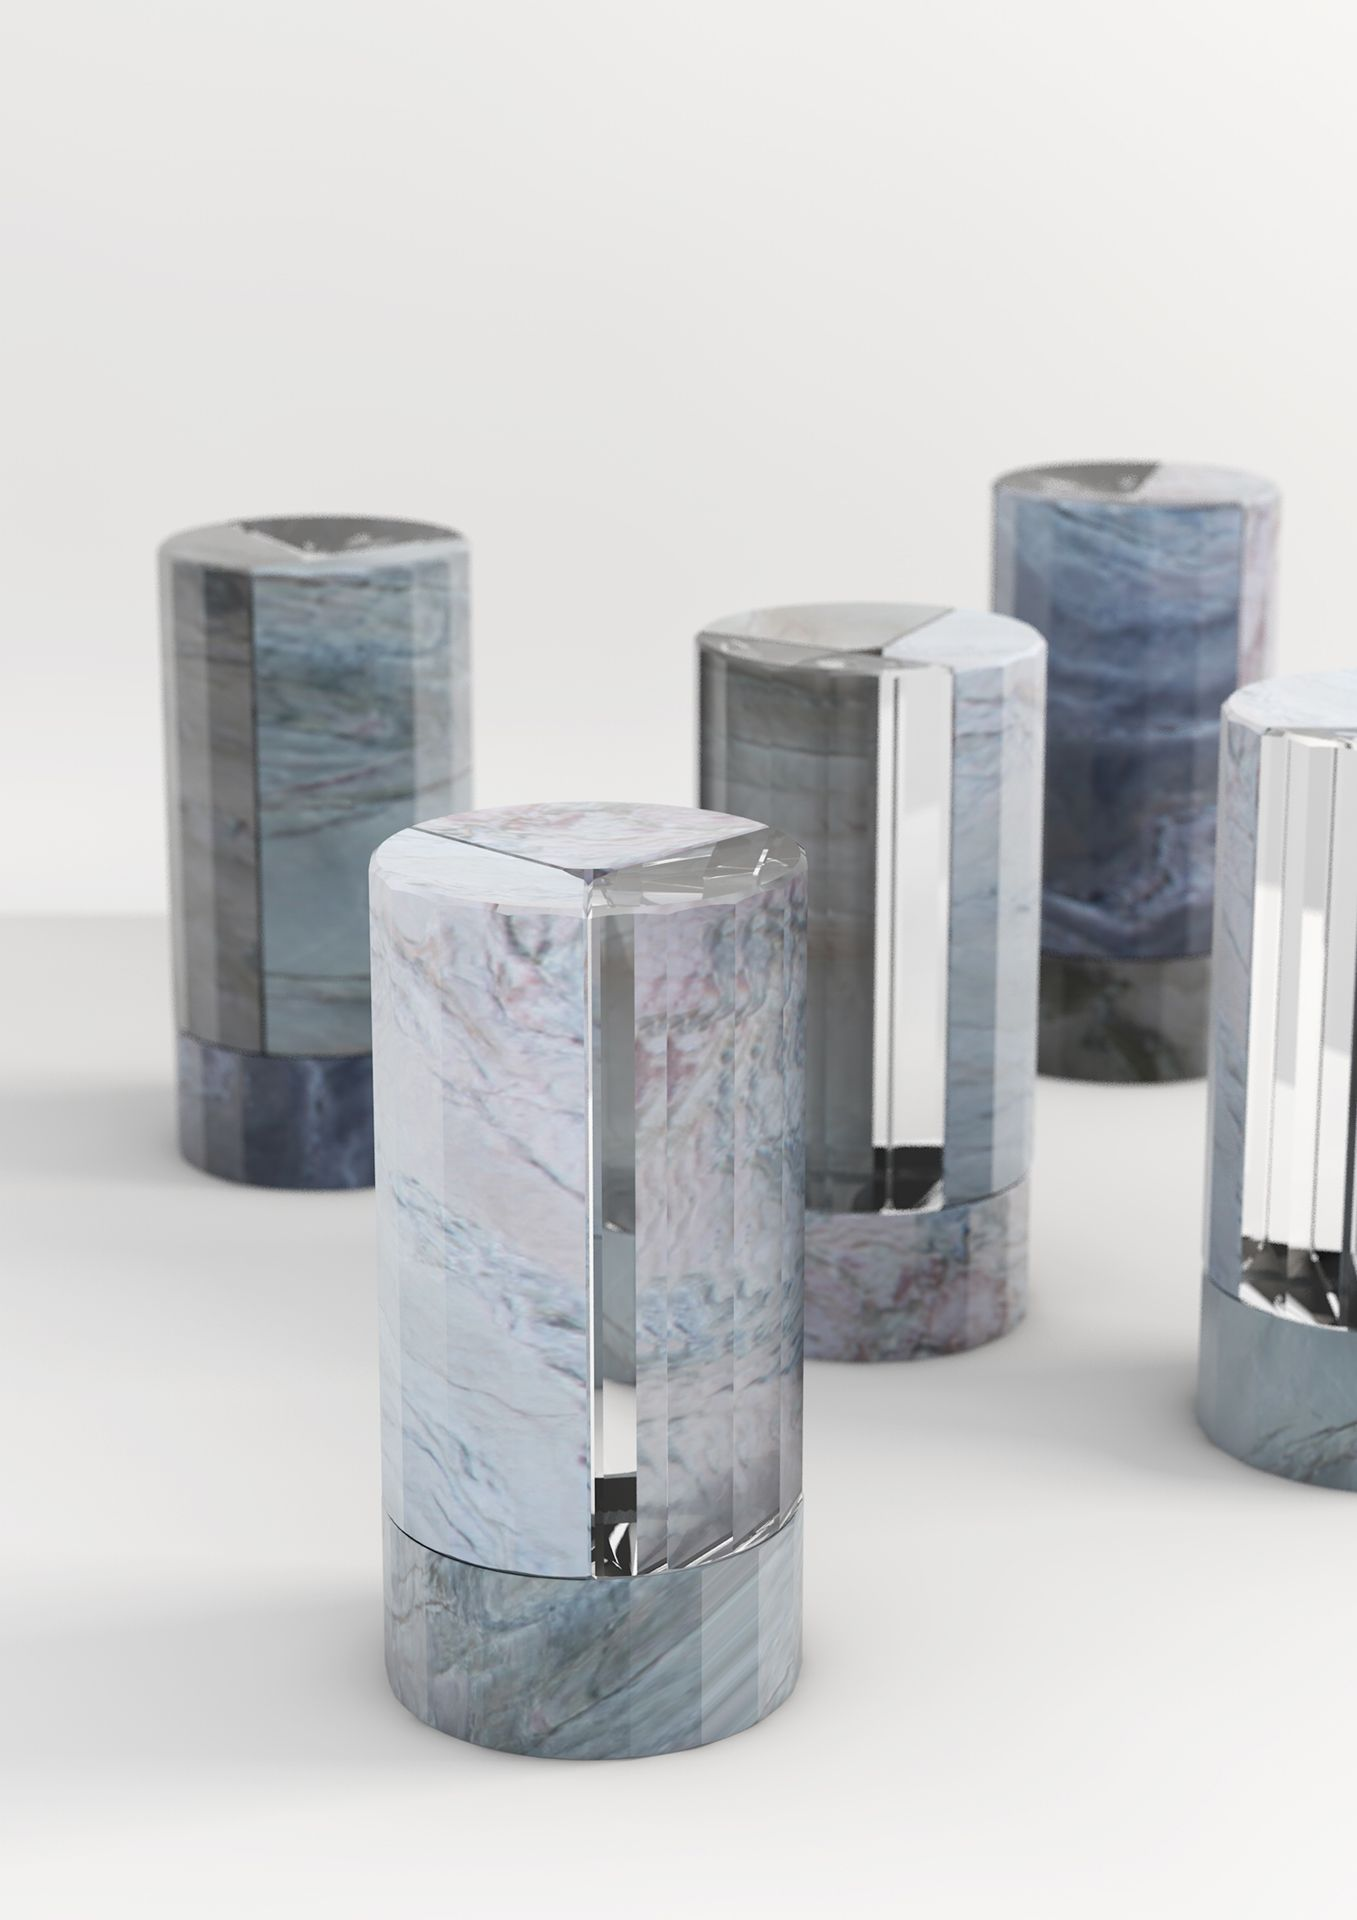 Aldo bakker crystal vase single stem vase crystal and marble aldo bakker crystal vase single stem vase crystal and marble 2016 reviewsmspy